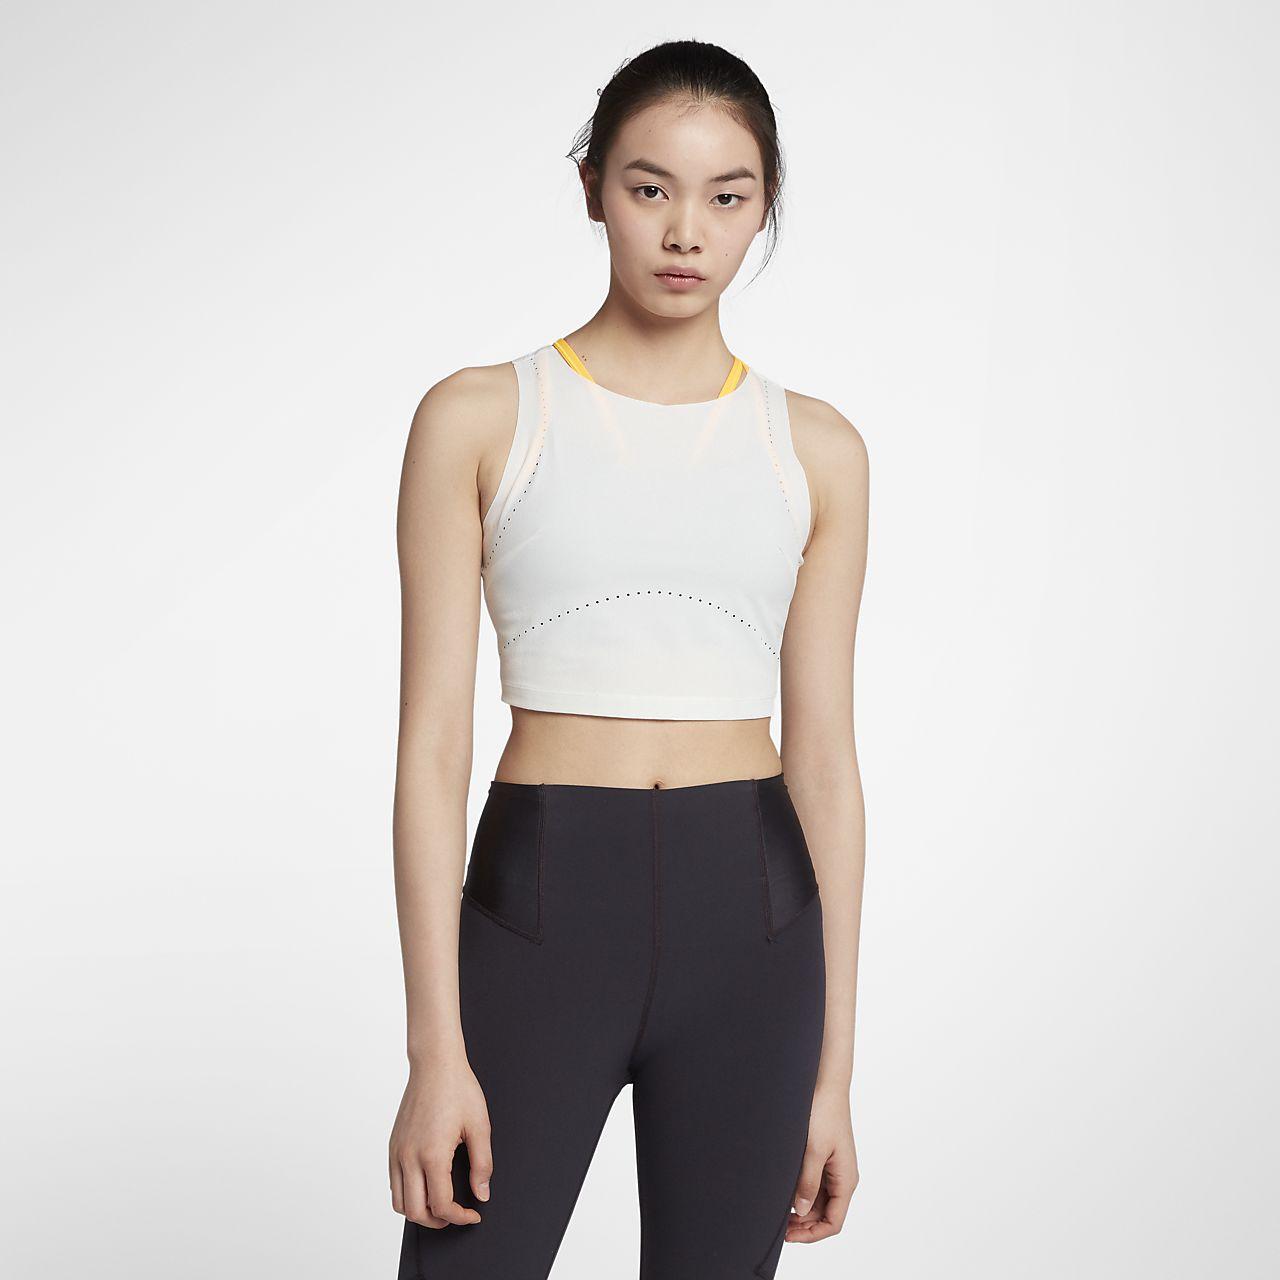 Nike Women's Training Tank